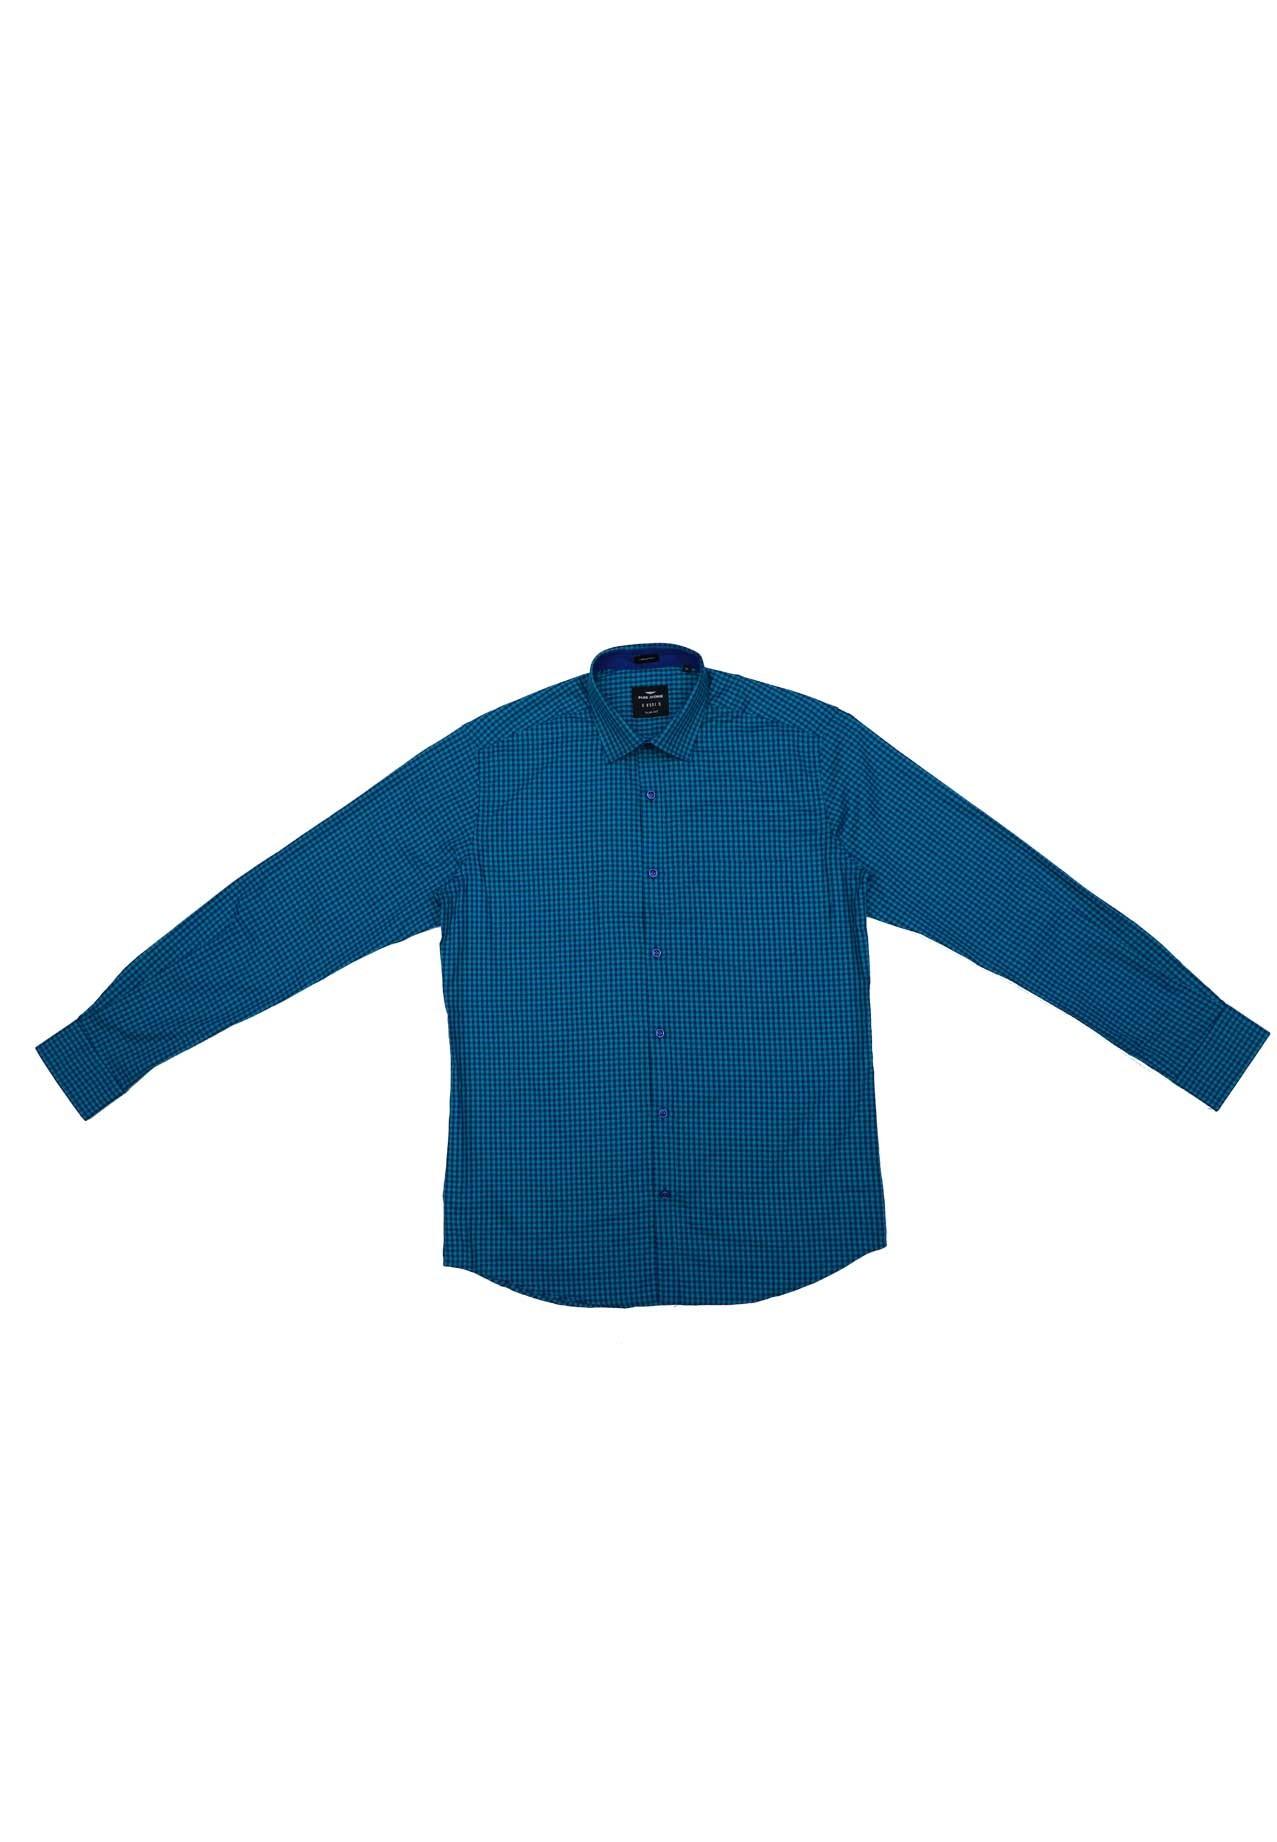 Park Avenue PMSY12343-N5 Mens Shirt, Size 44